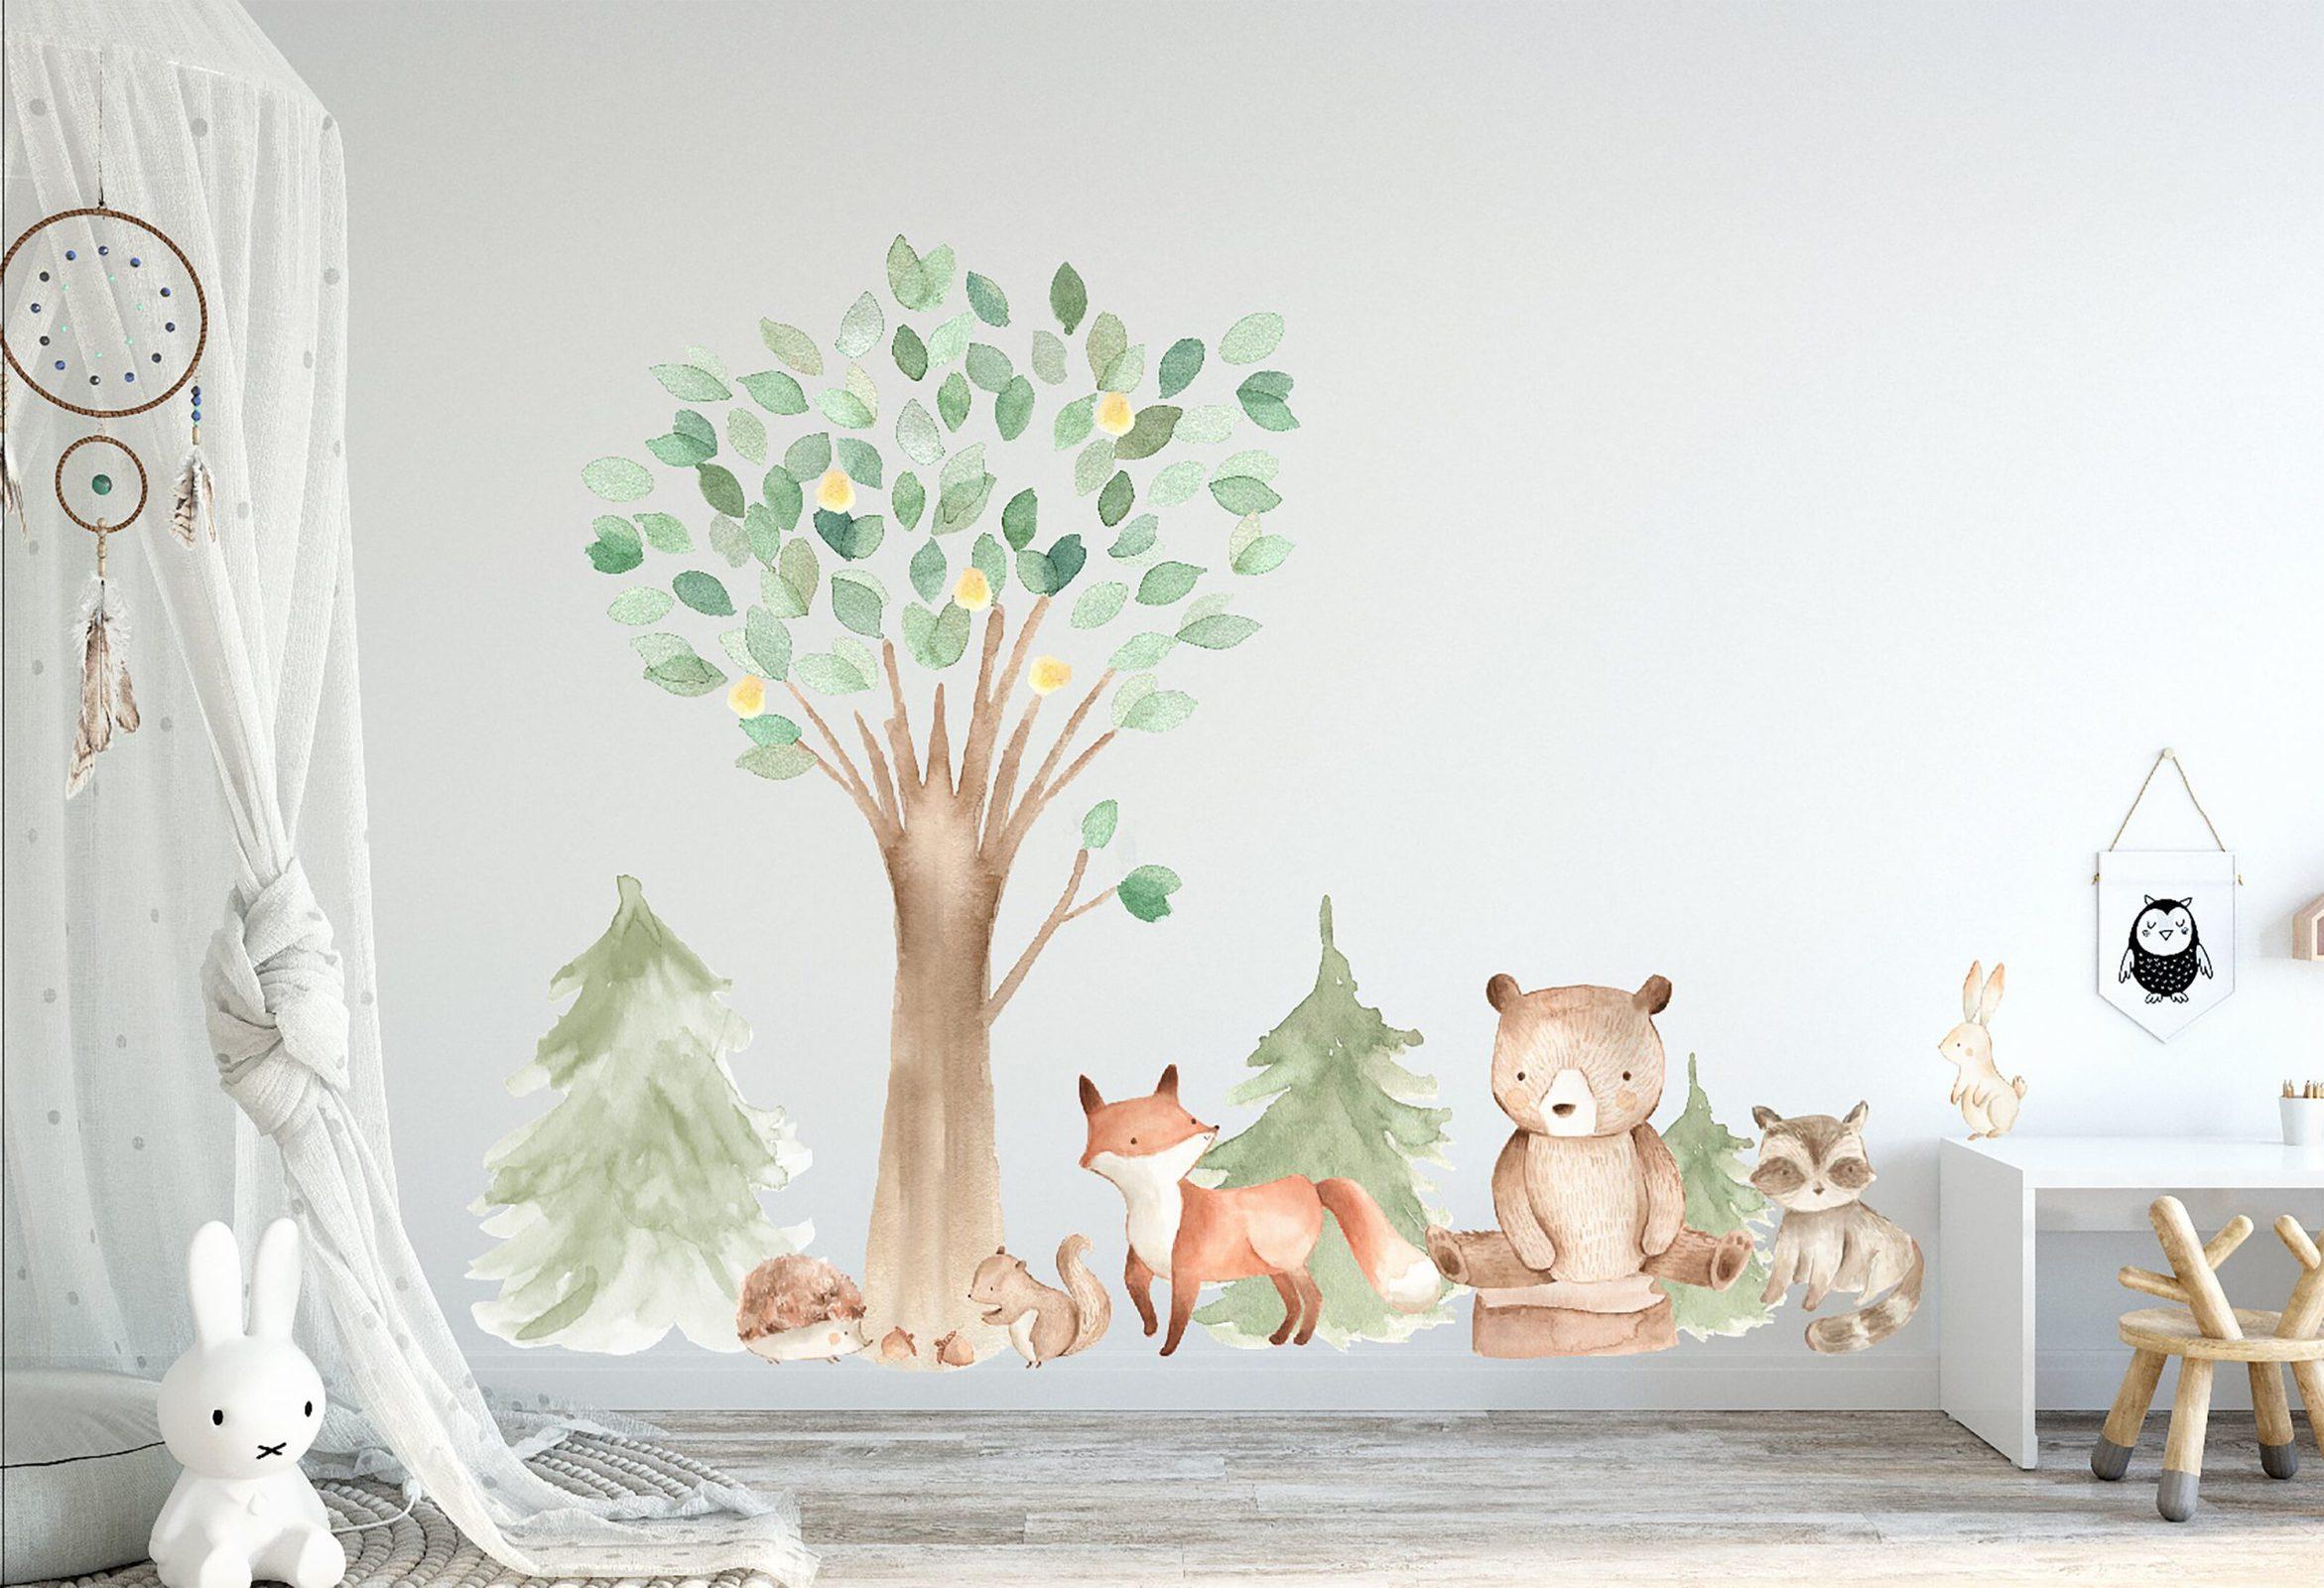 15 Adorable Nursery Wall Decor Ideas